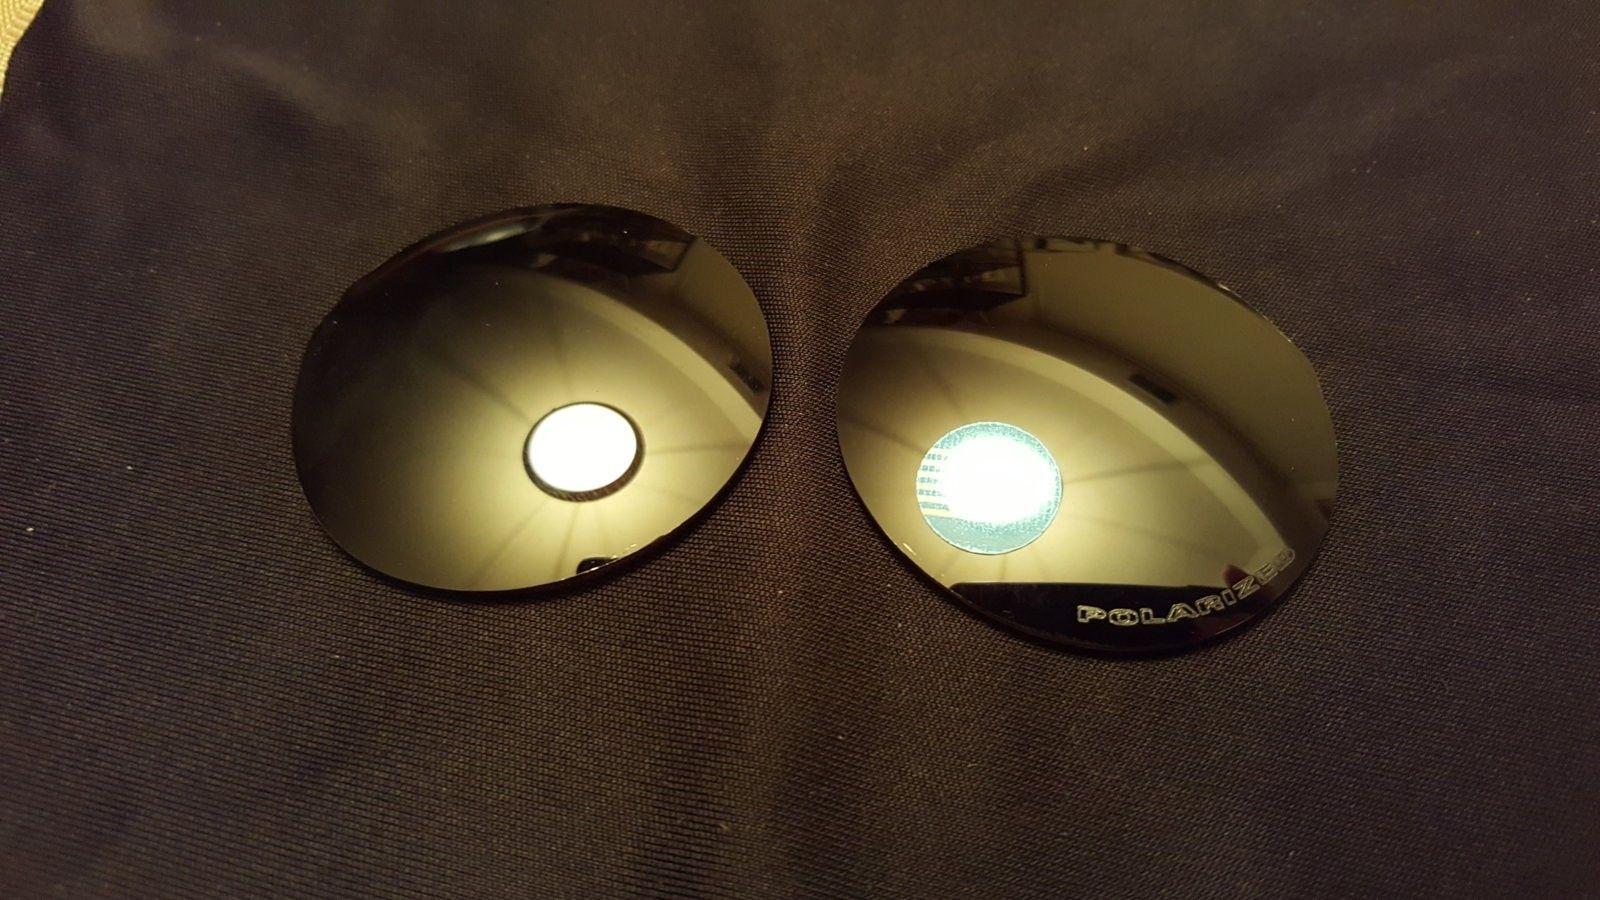 Madman Tungsten Iridium Polarized Lenses - 14629469541491180317015.jpg